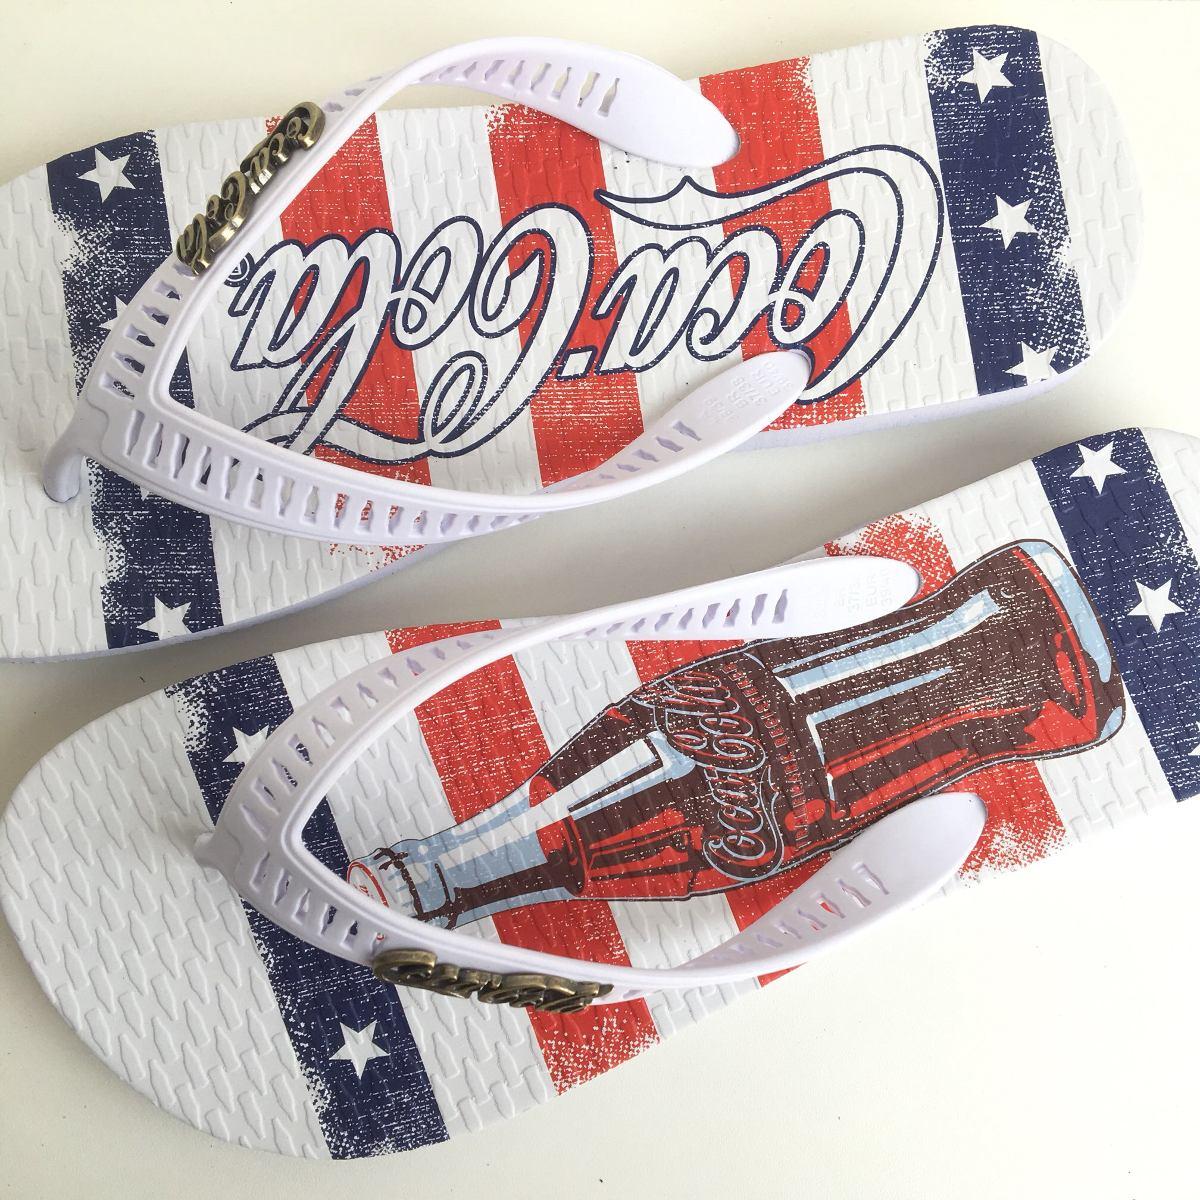 aa4bba2b71 chinelo masculino coca cola shoes original america. Carregando zoom.